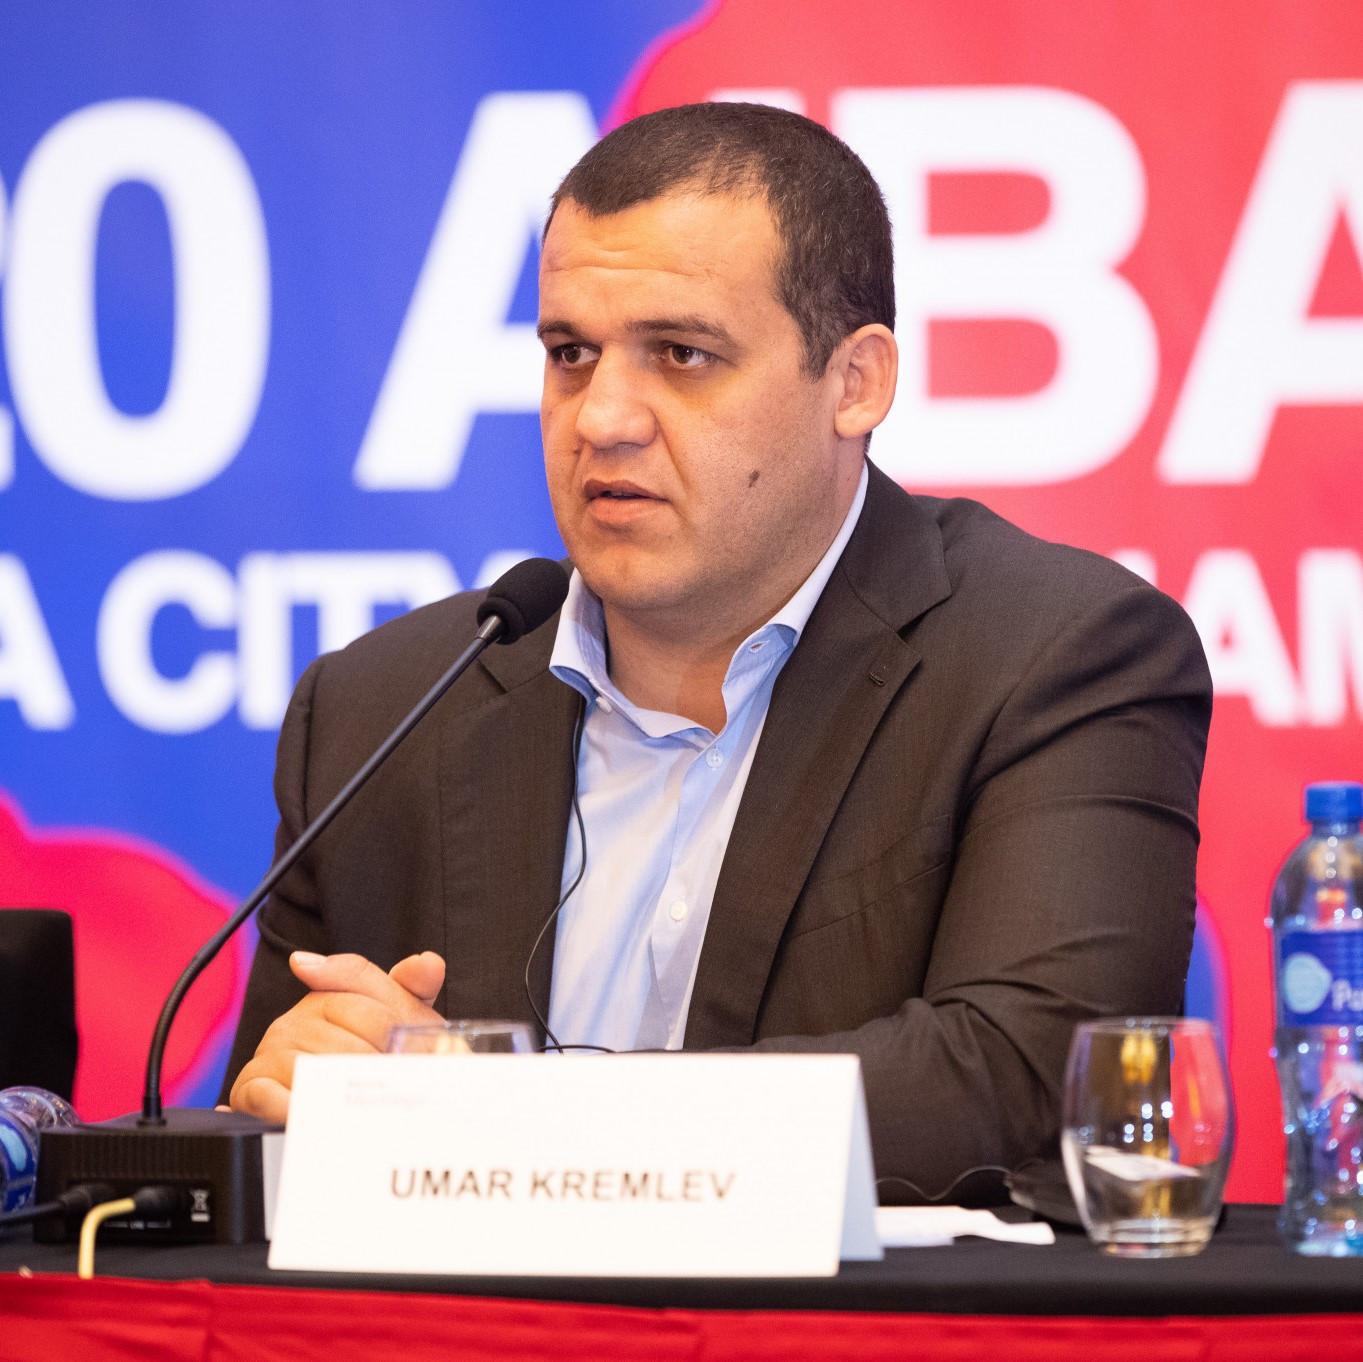 Umar Kremlev becomes AIBA's first permanent President since Gafur Rakhimov ©AIBA